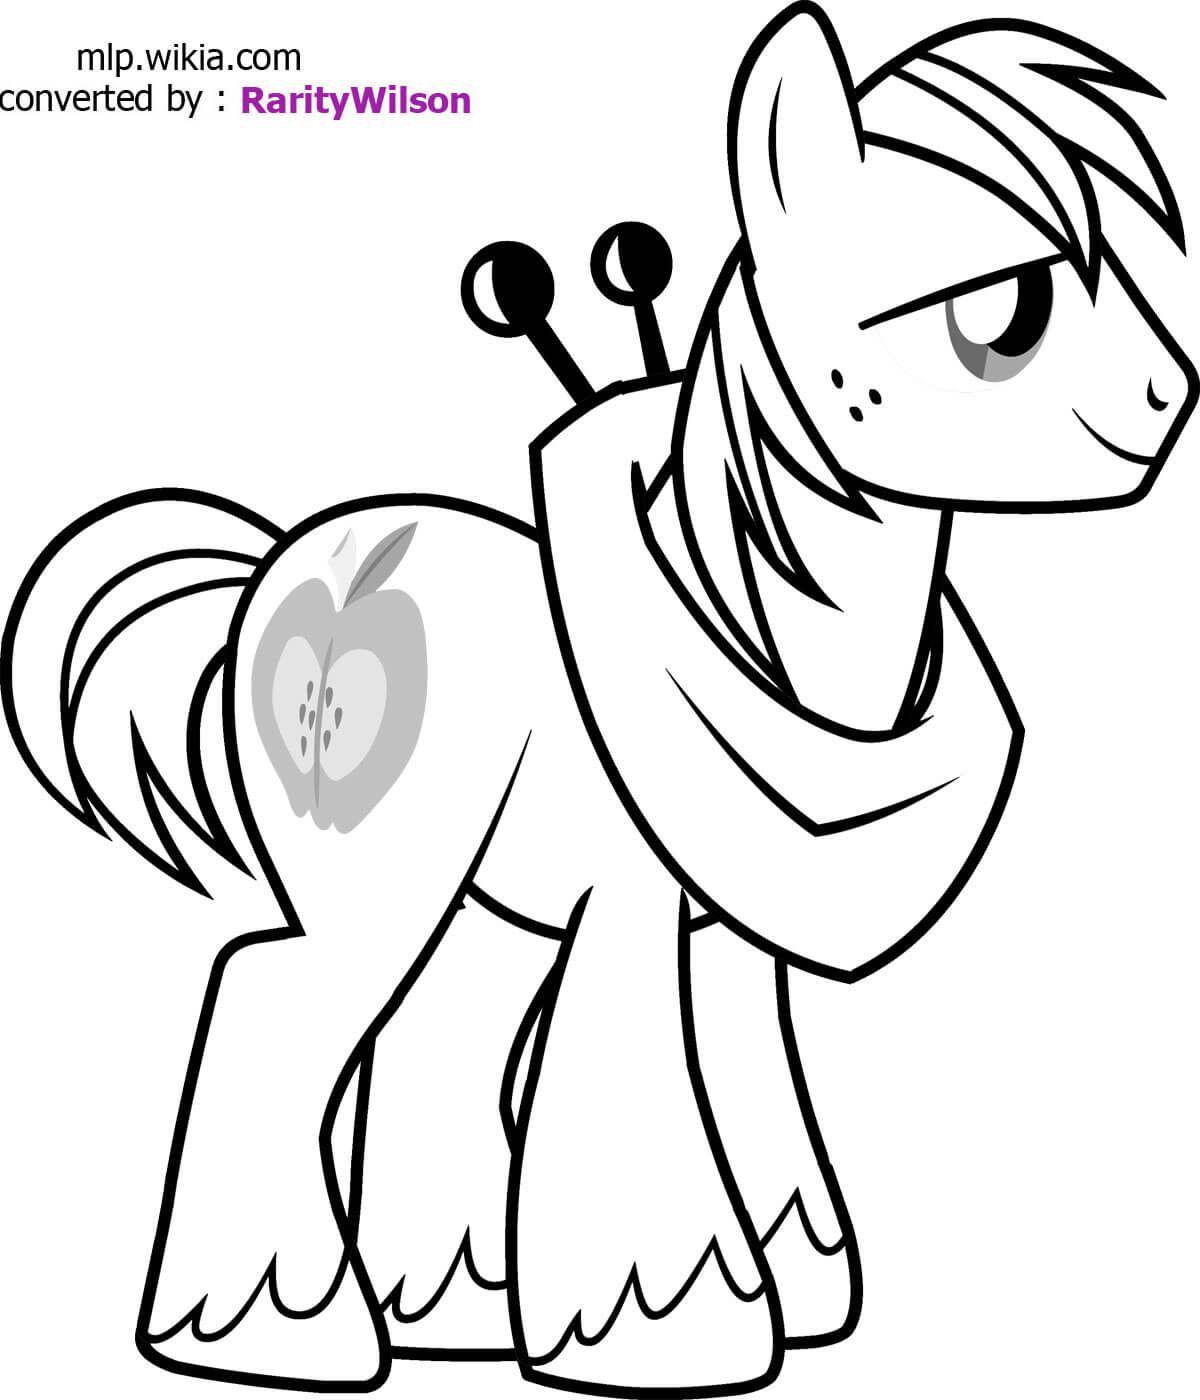 Pin de ScribbleFun en Free Cartoon Series Coloring Pages | Pinterest